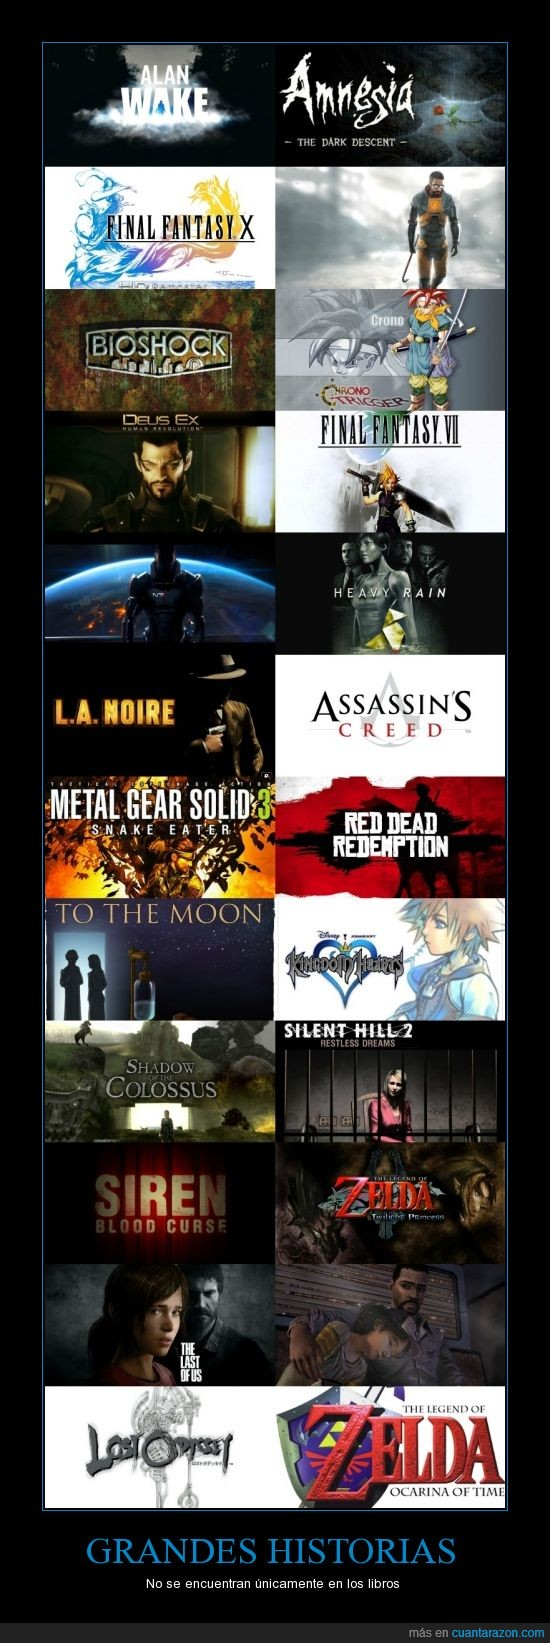 historia,narrativas,trama,videojuegos